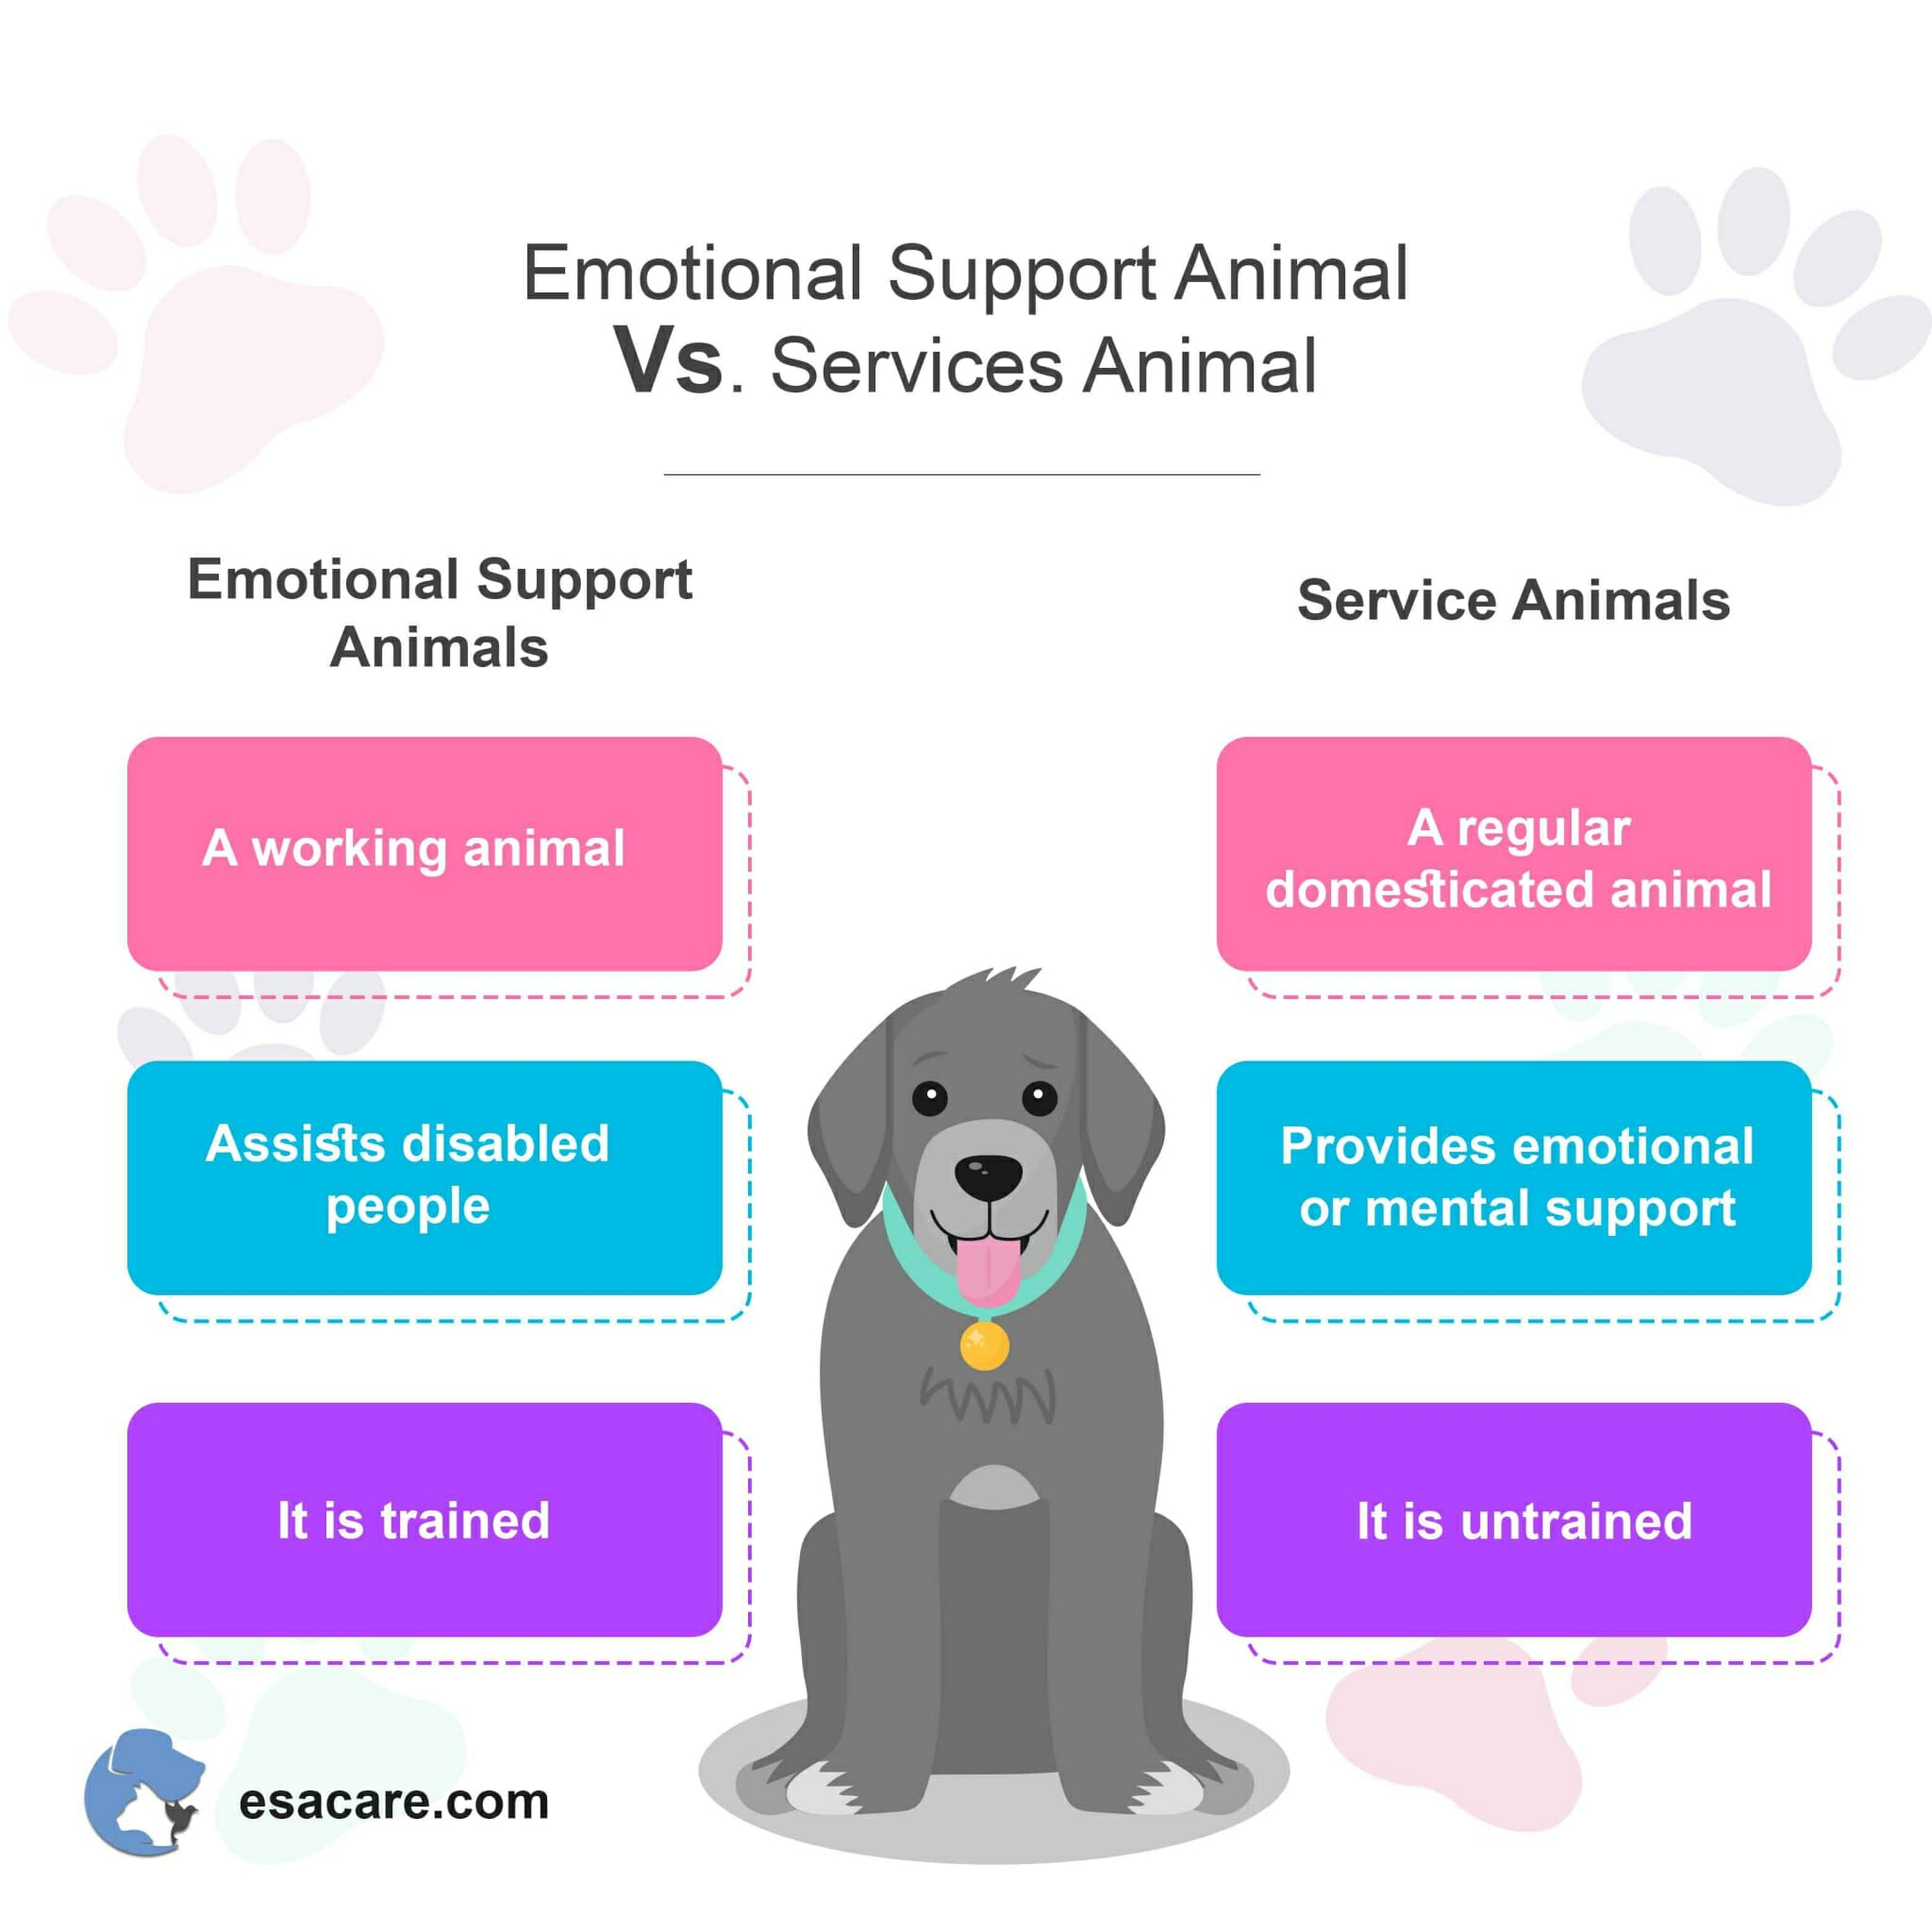 ESA vs service animal